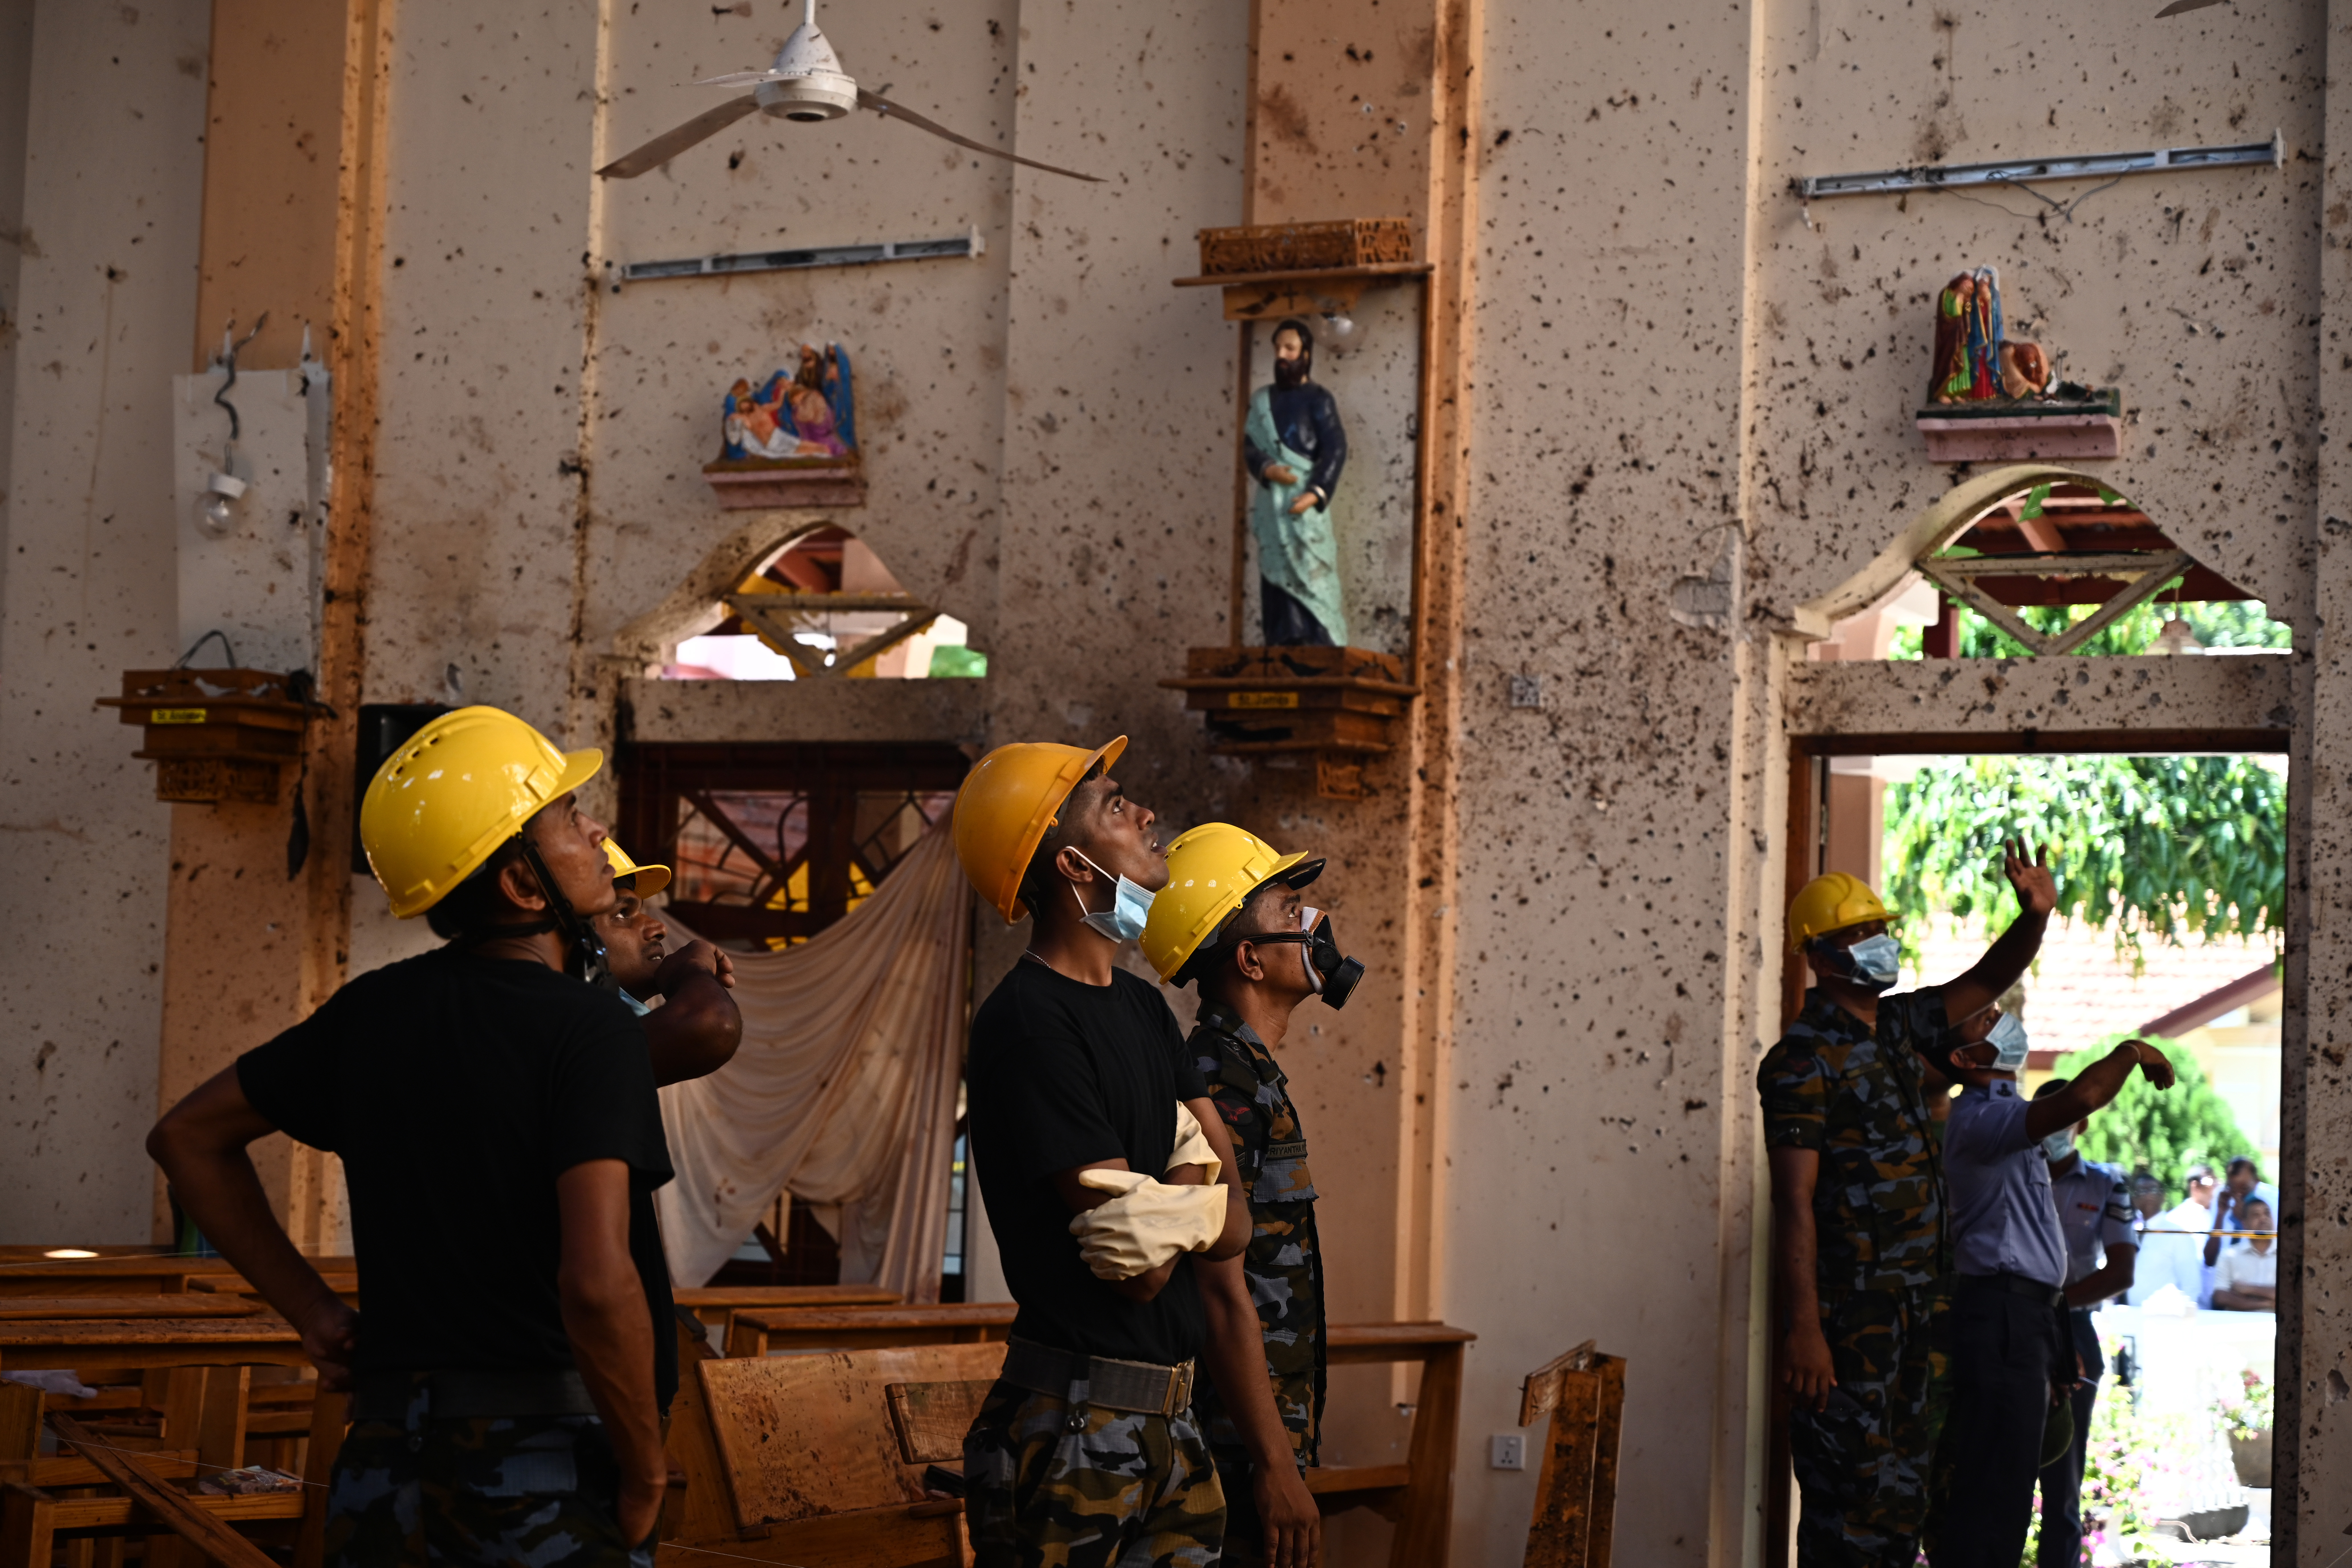 Foto: Jewel SAMAD / AFP